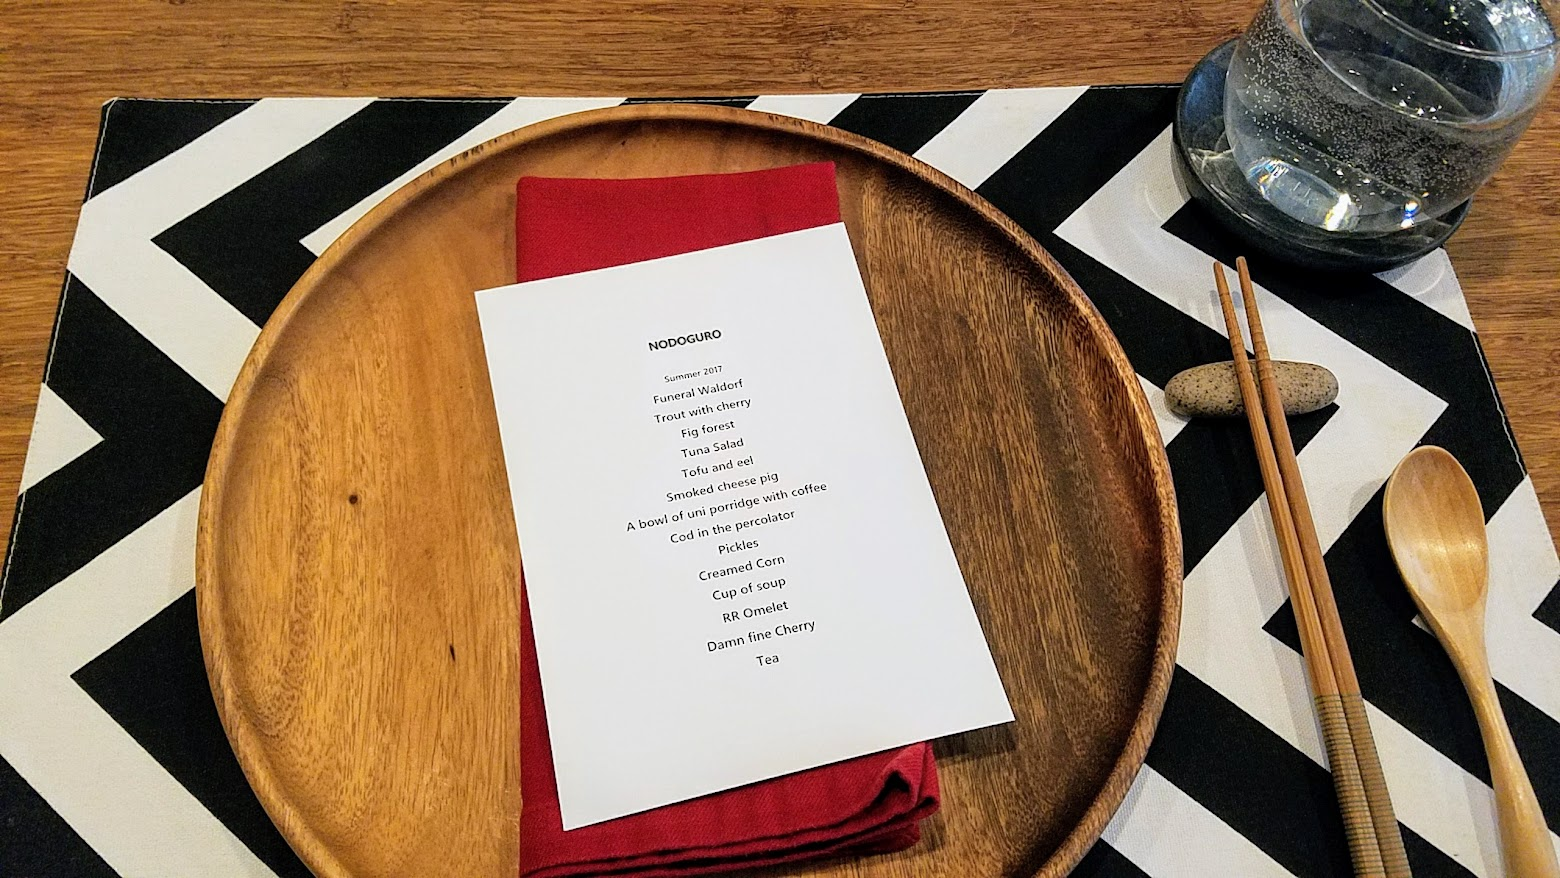 Nodoguro Twin Peaks Dinner 2 place setting and menu